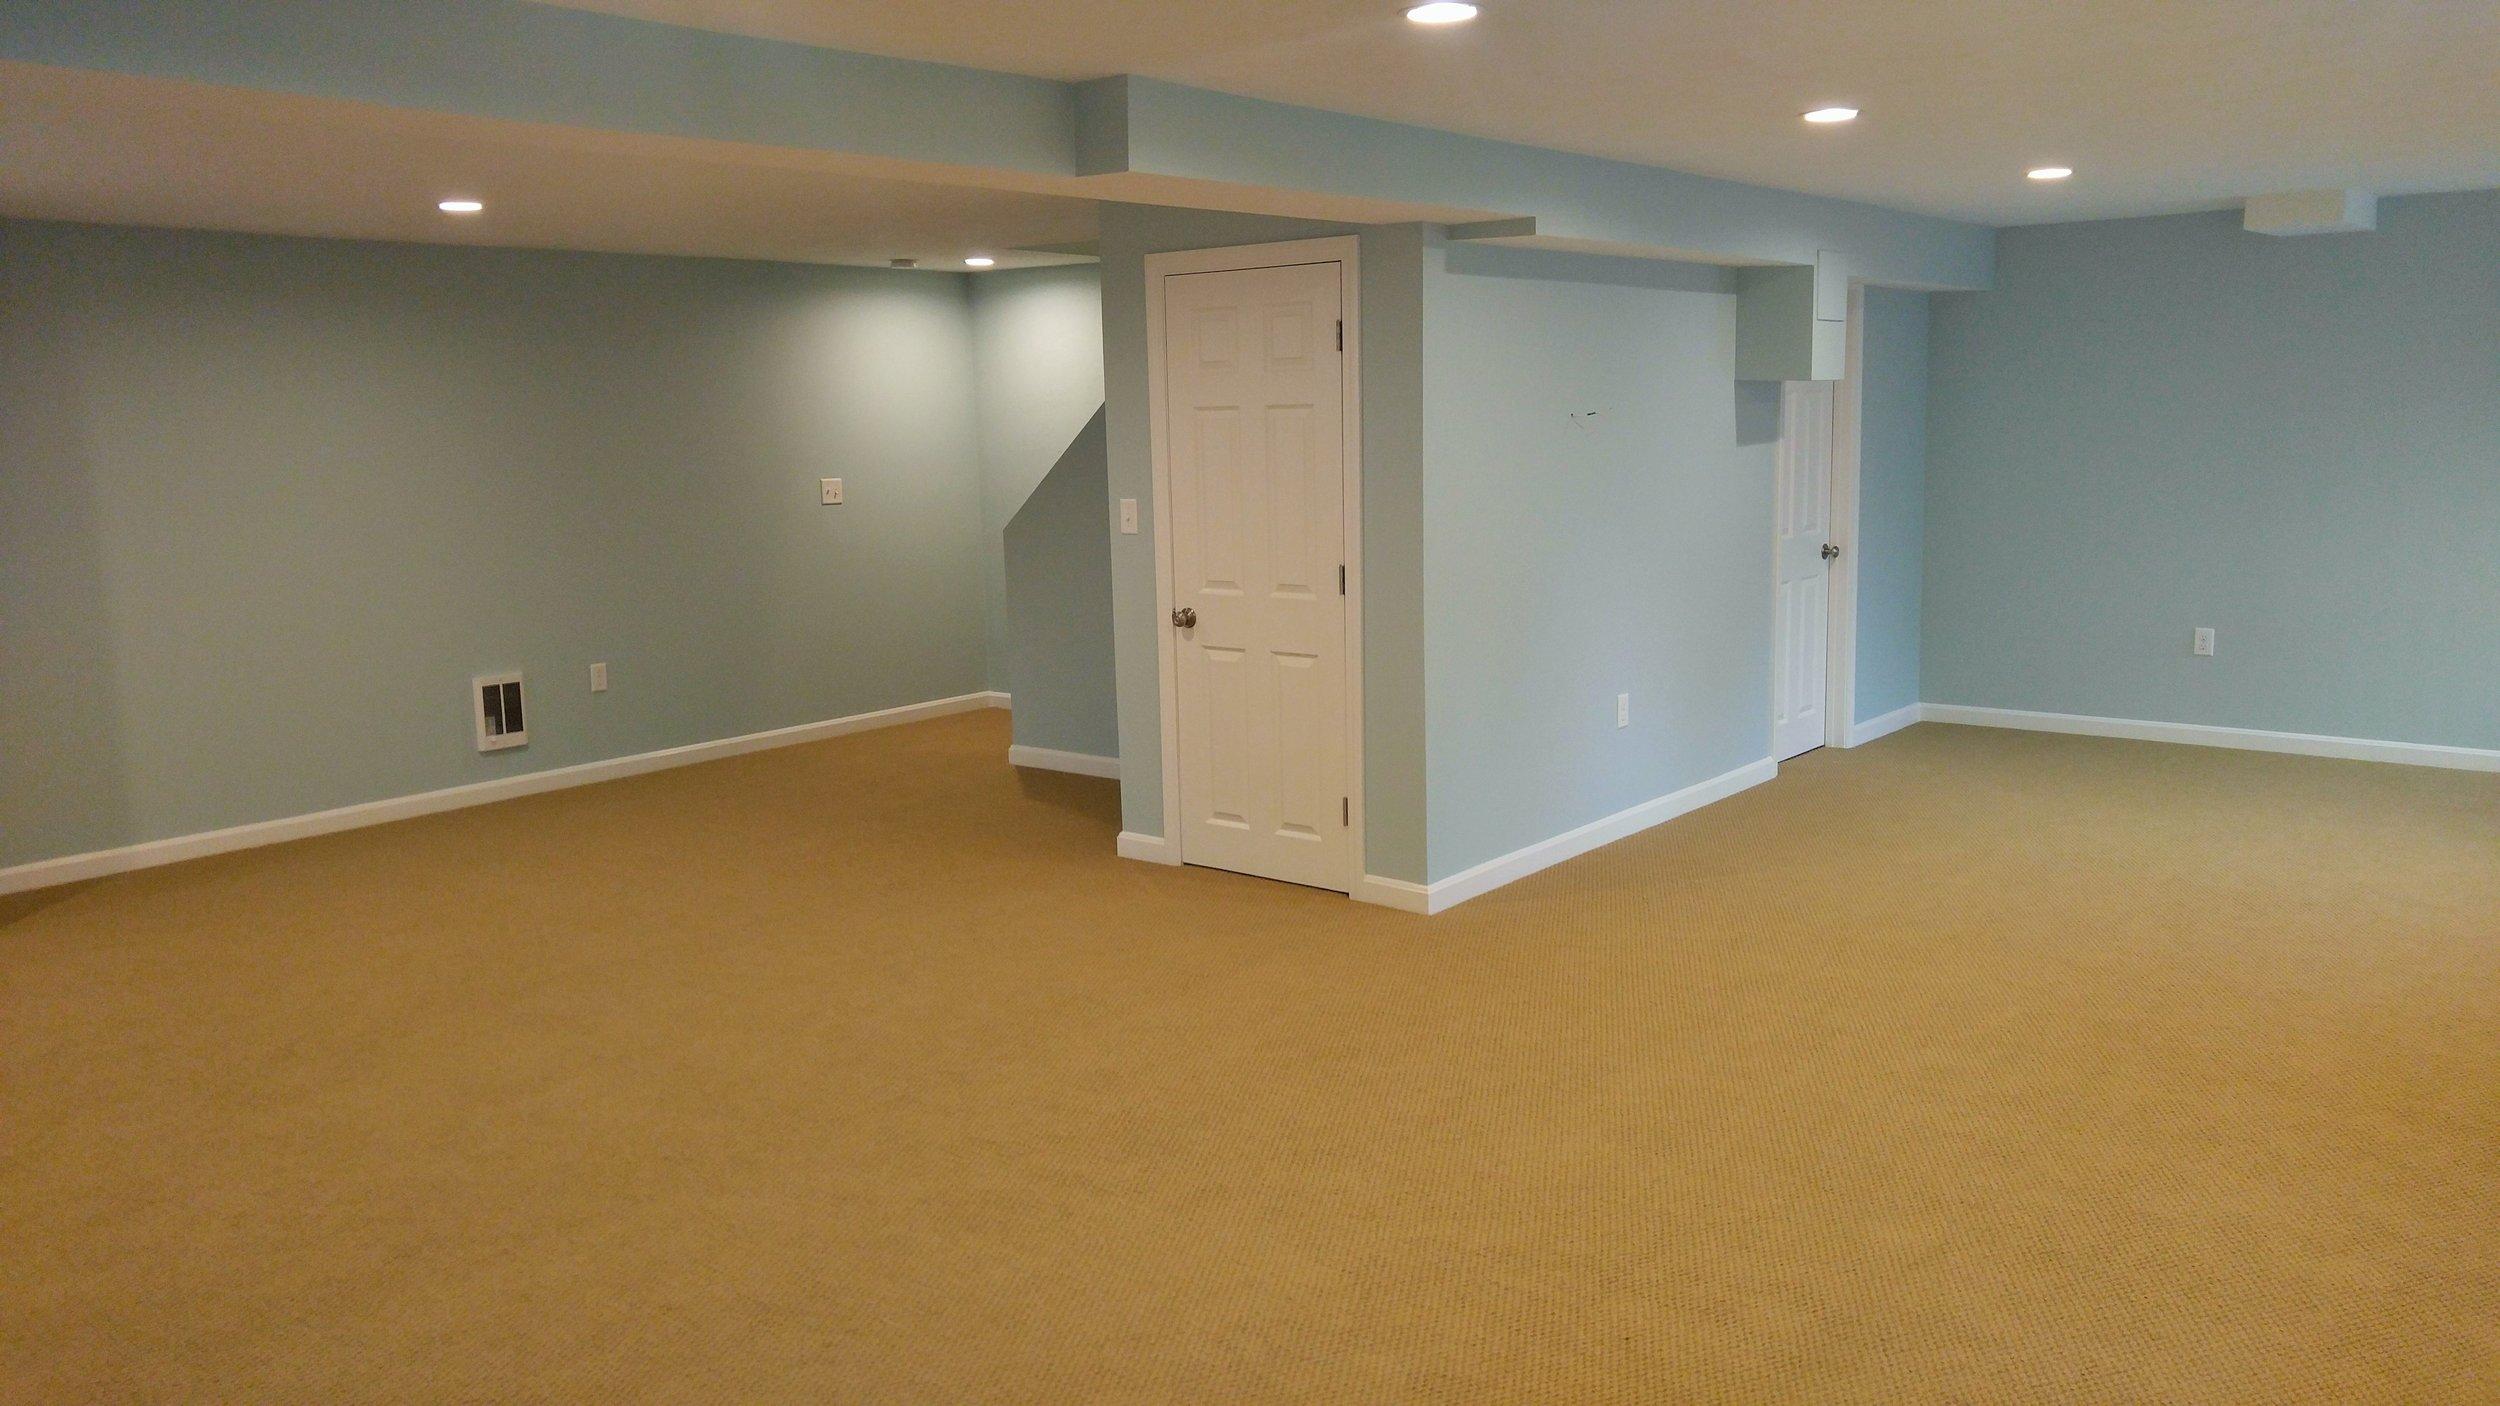 Basement Renovation/Remodel - Oxford MA